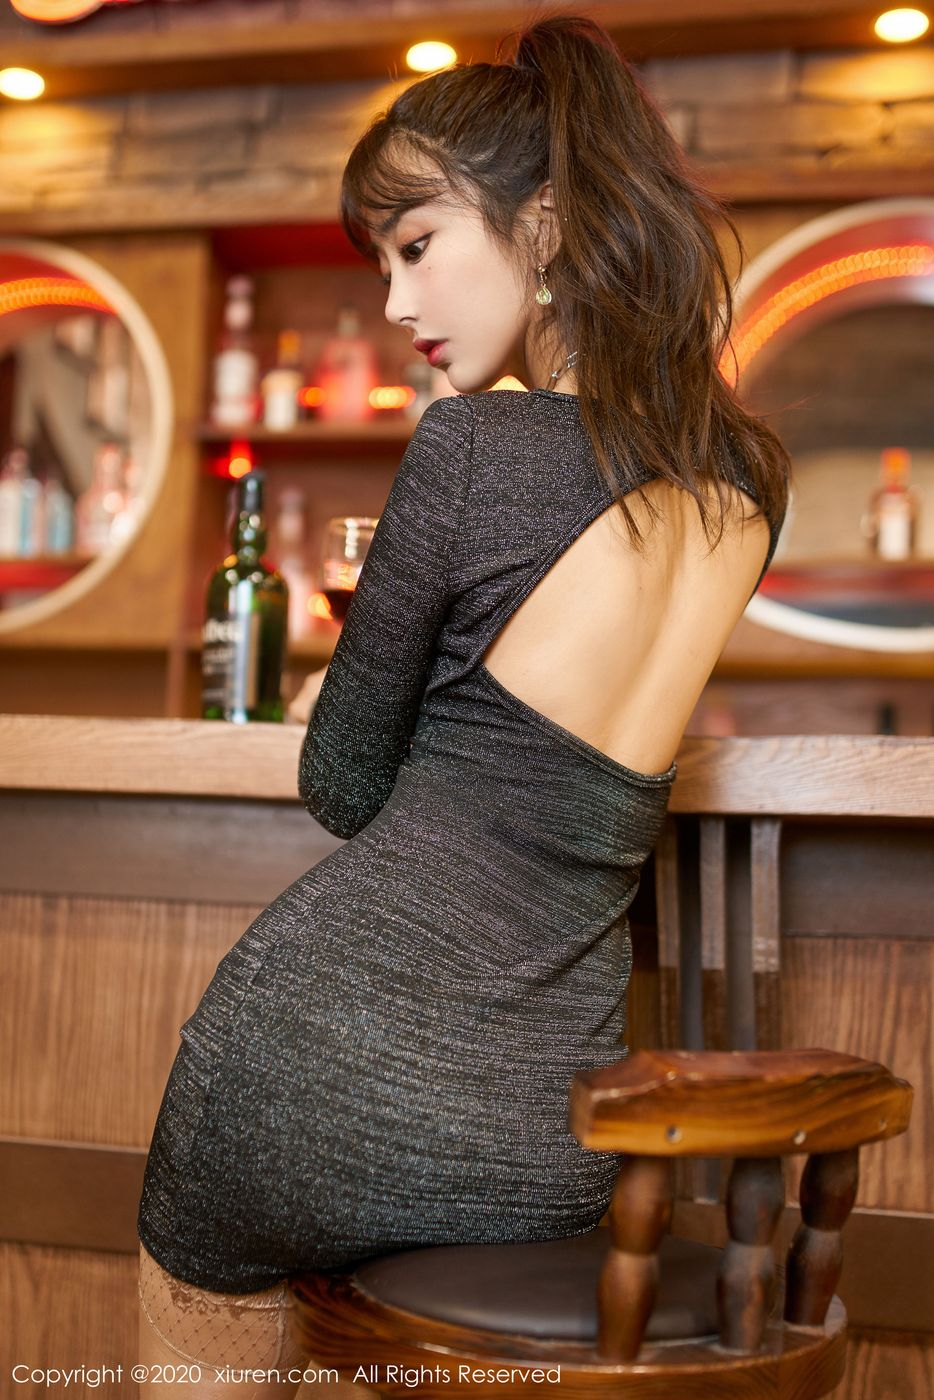 Vol.225 丝袜美腿翘臀长腿美女私房照美女模特秀人网-林子欣完整私房照合集